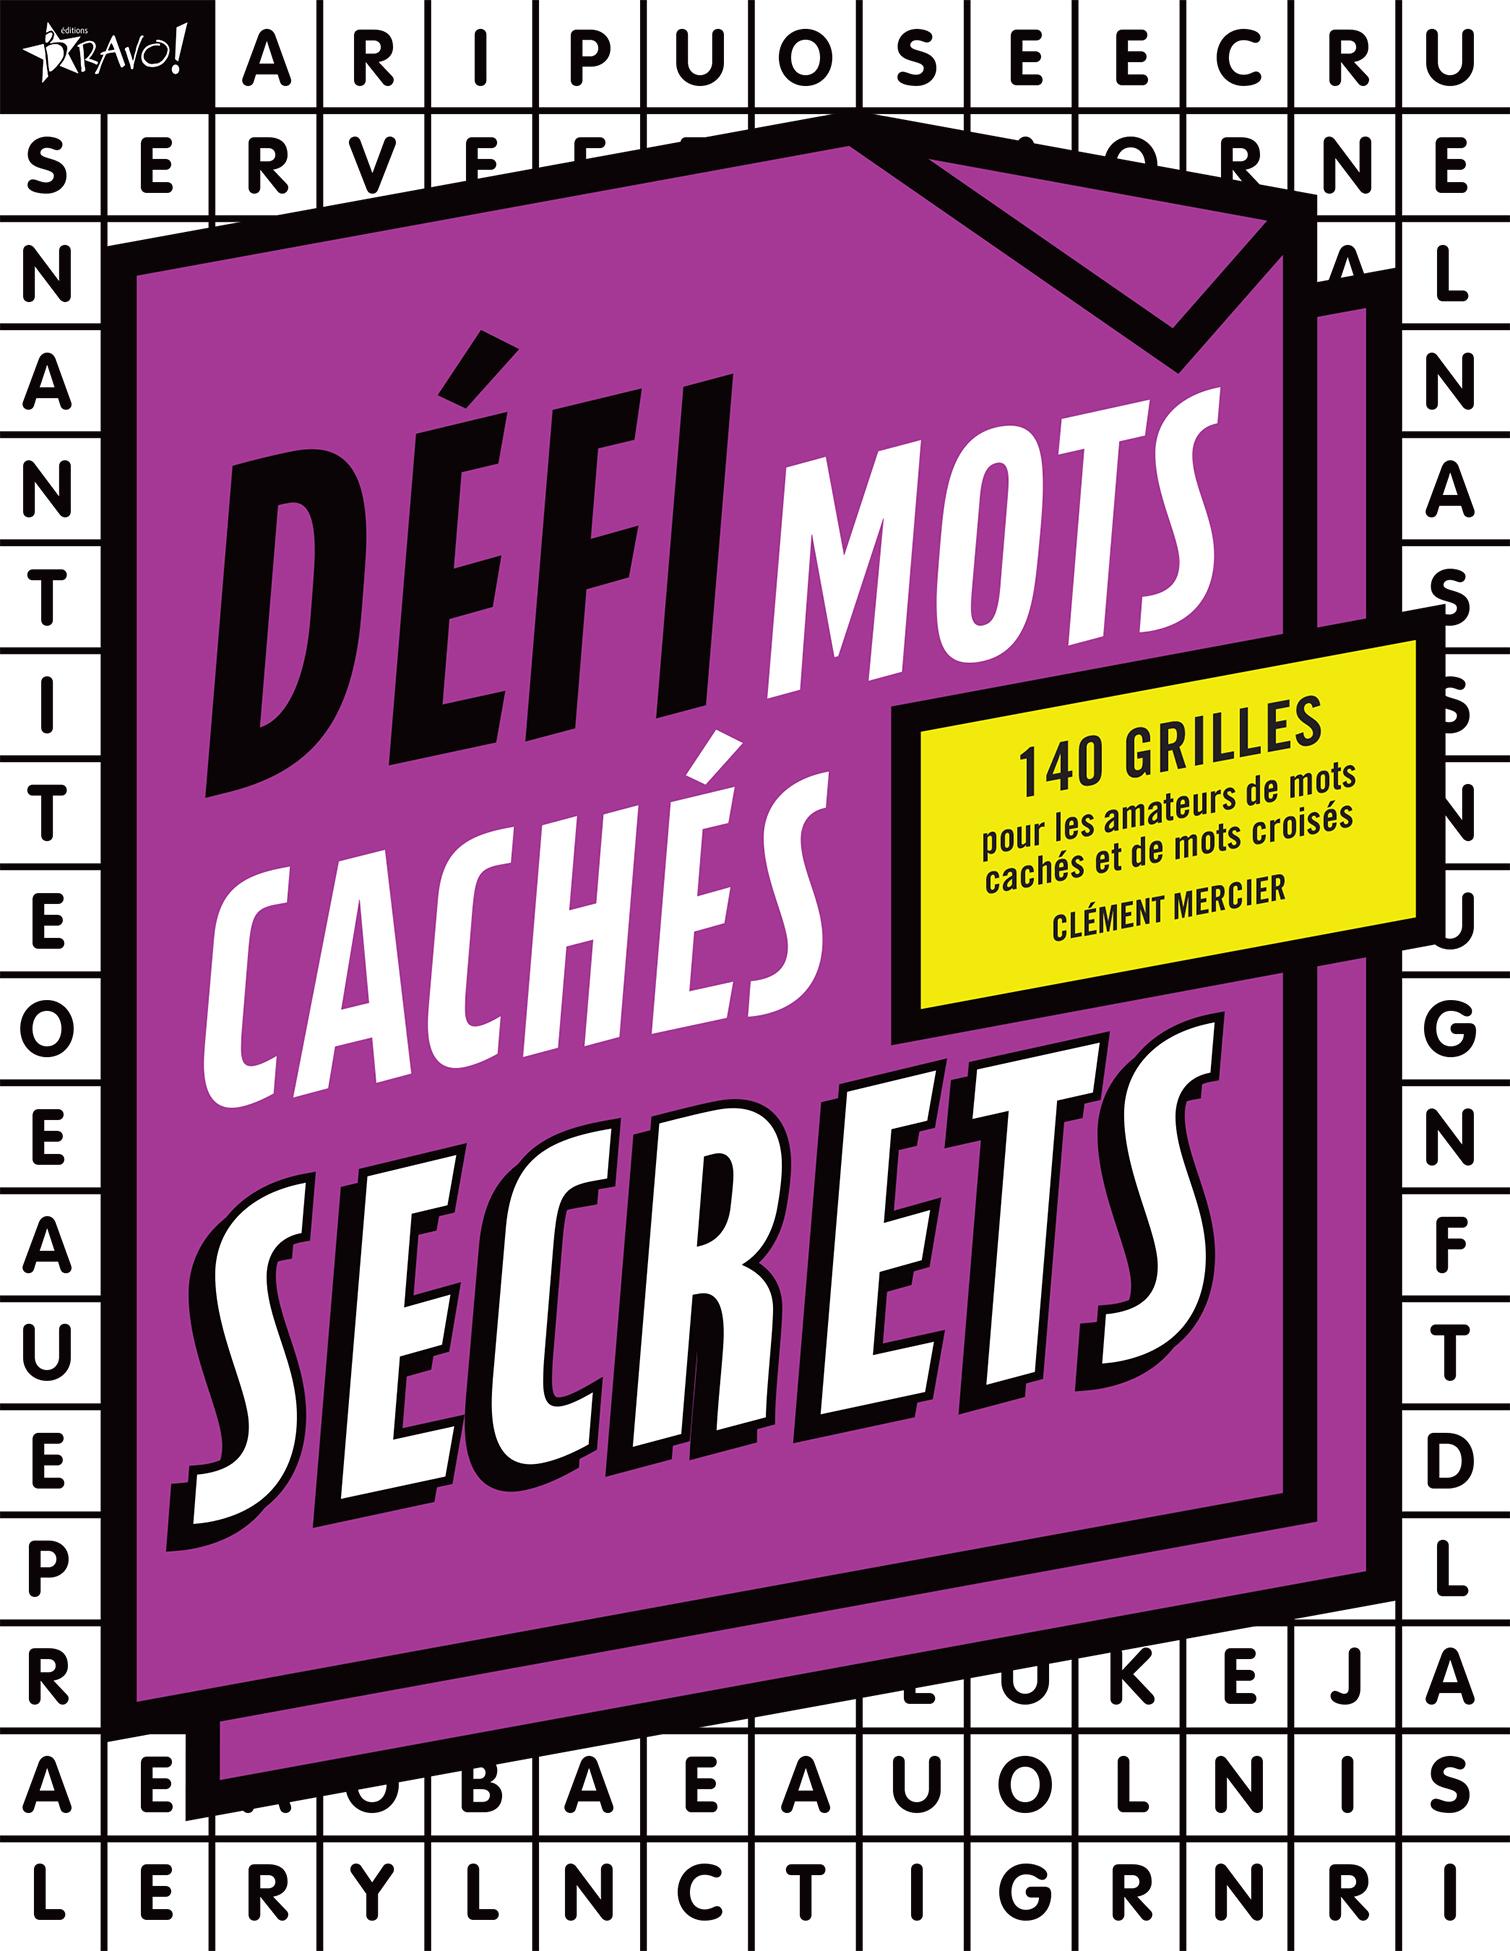 315_DefiMotsCachesSecrets_C1